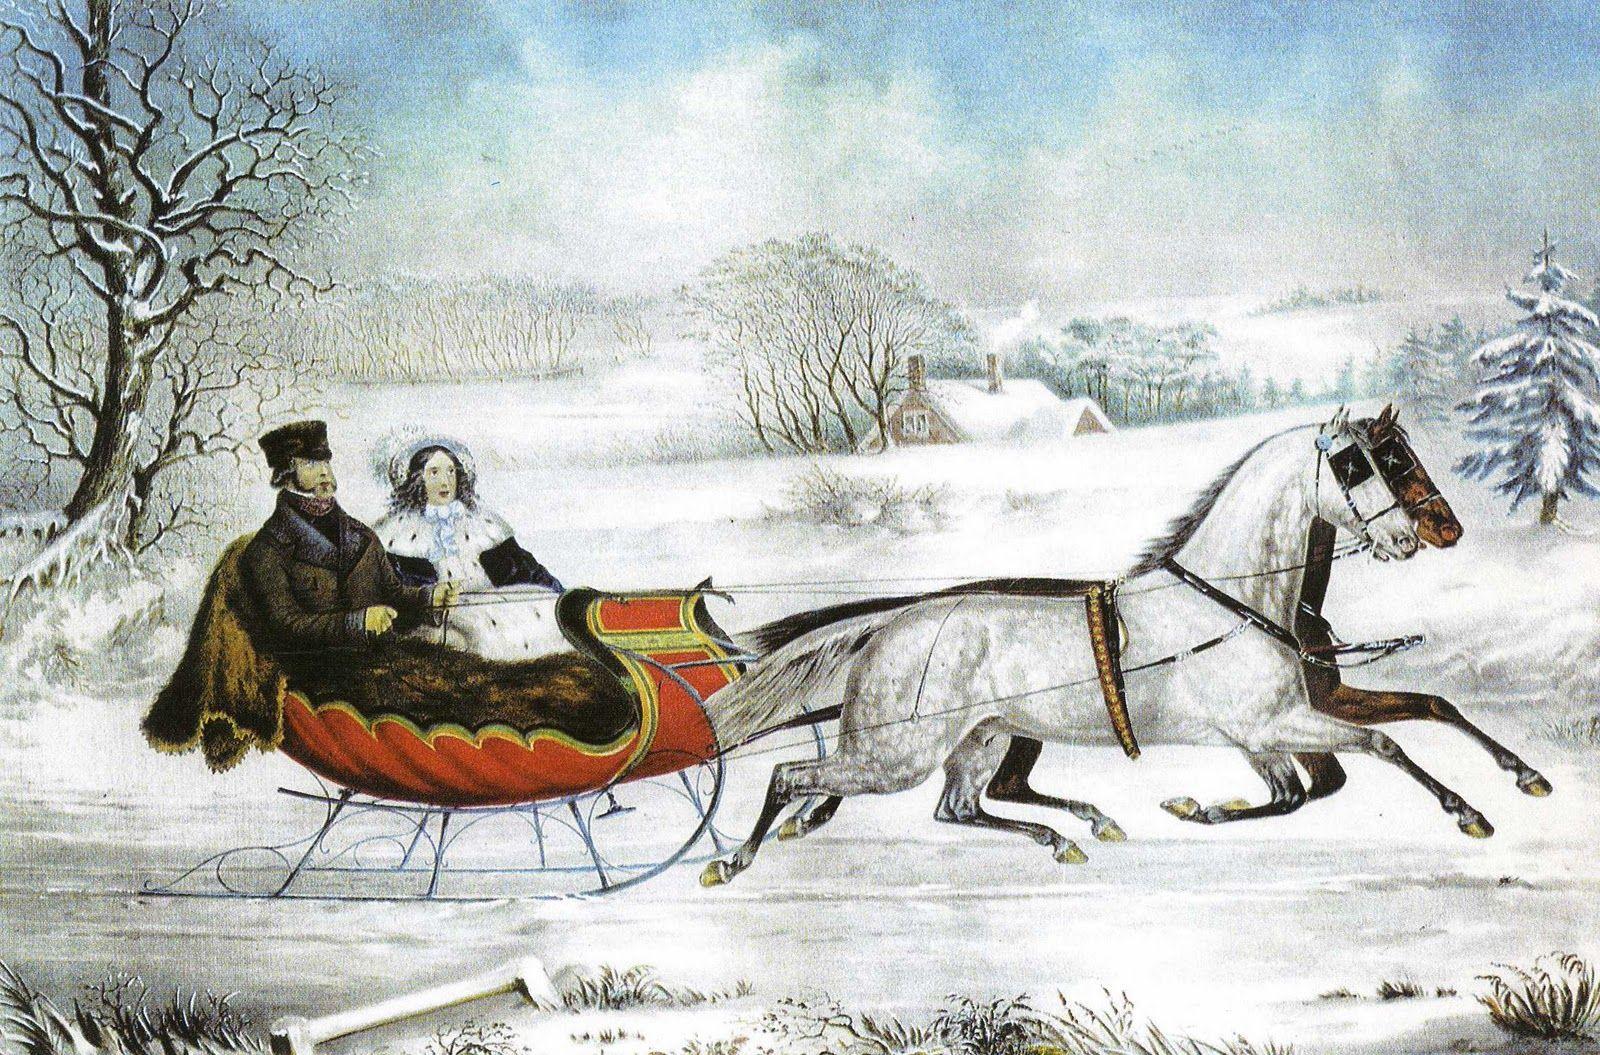 Currier & Ives Winter Scenes. My Paisley World. http://mypaisleyworld.blogspot.com/